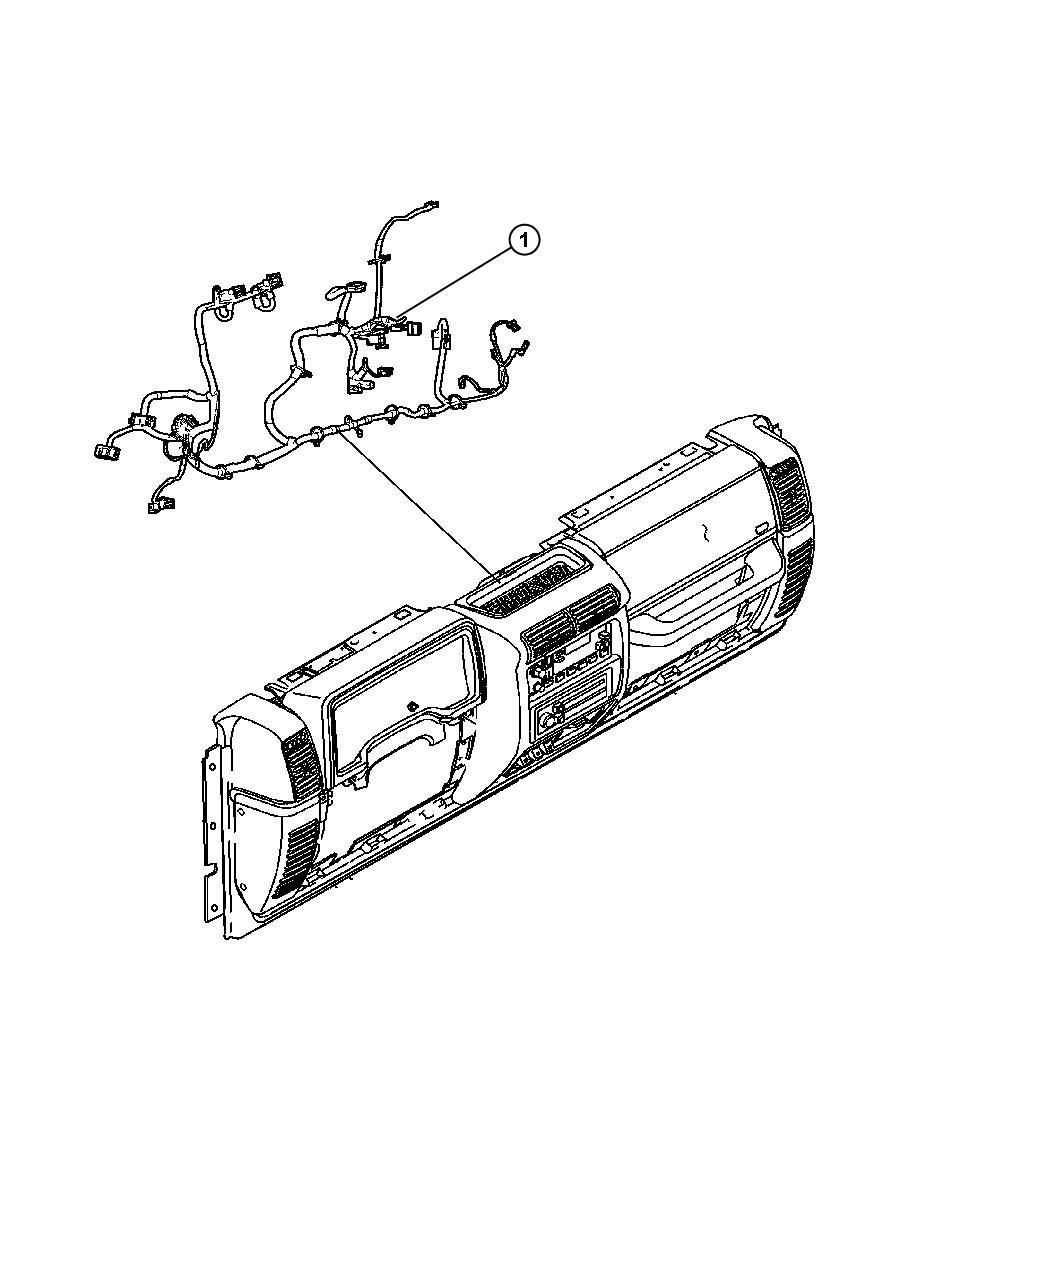 Jeep Wrangler Wiring Instrument Panel Manual Windows